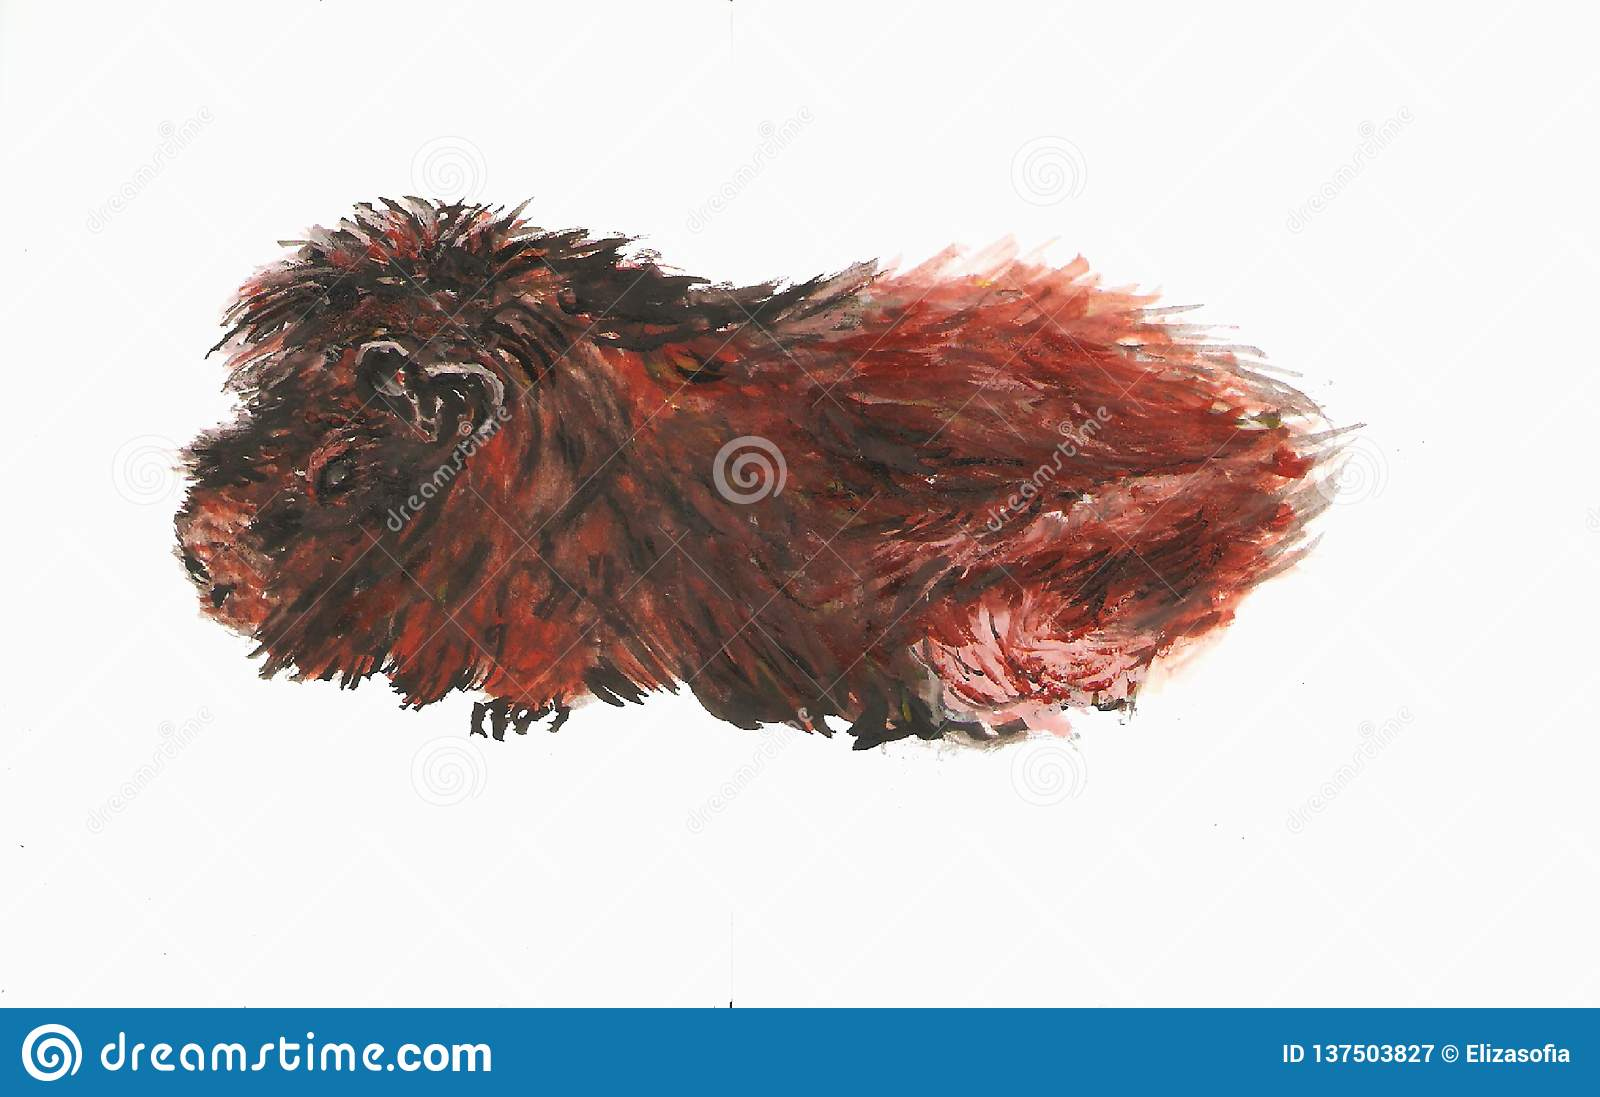 Gemaltes Meerschweinchen